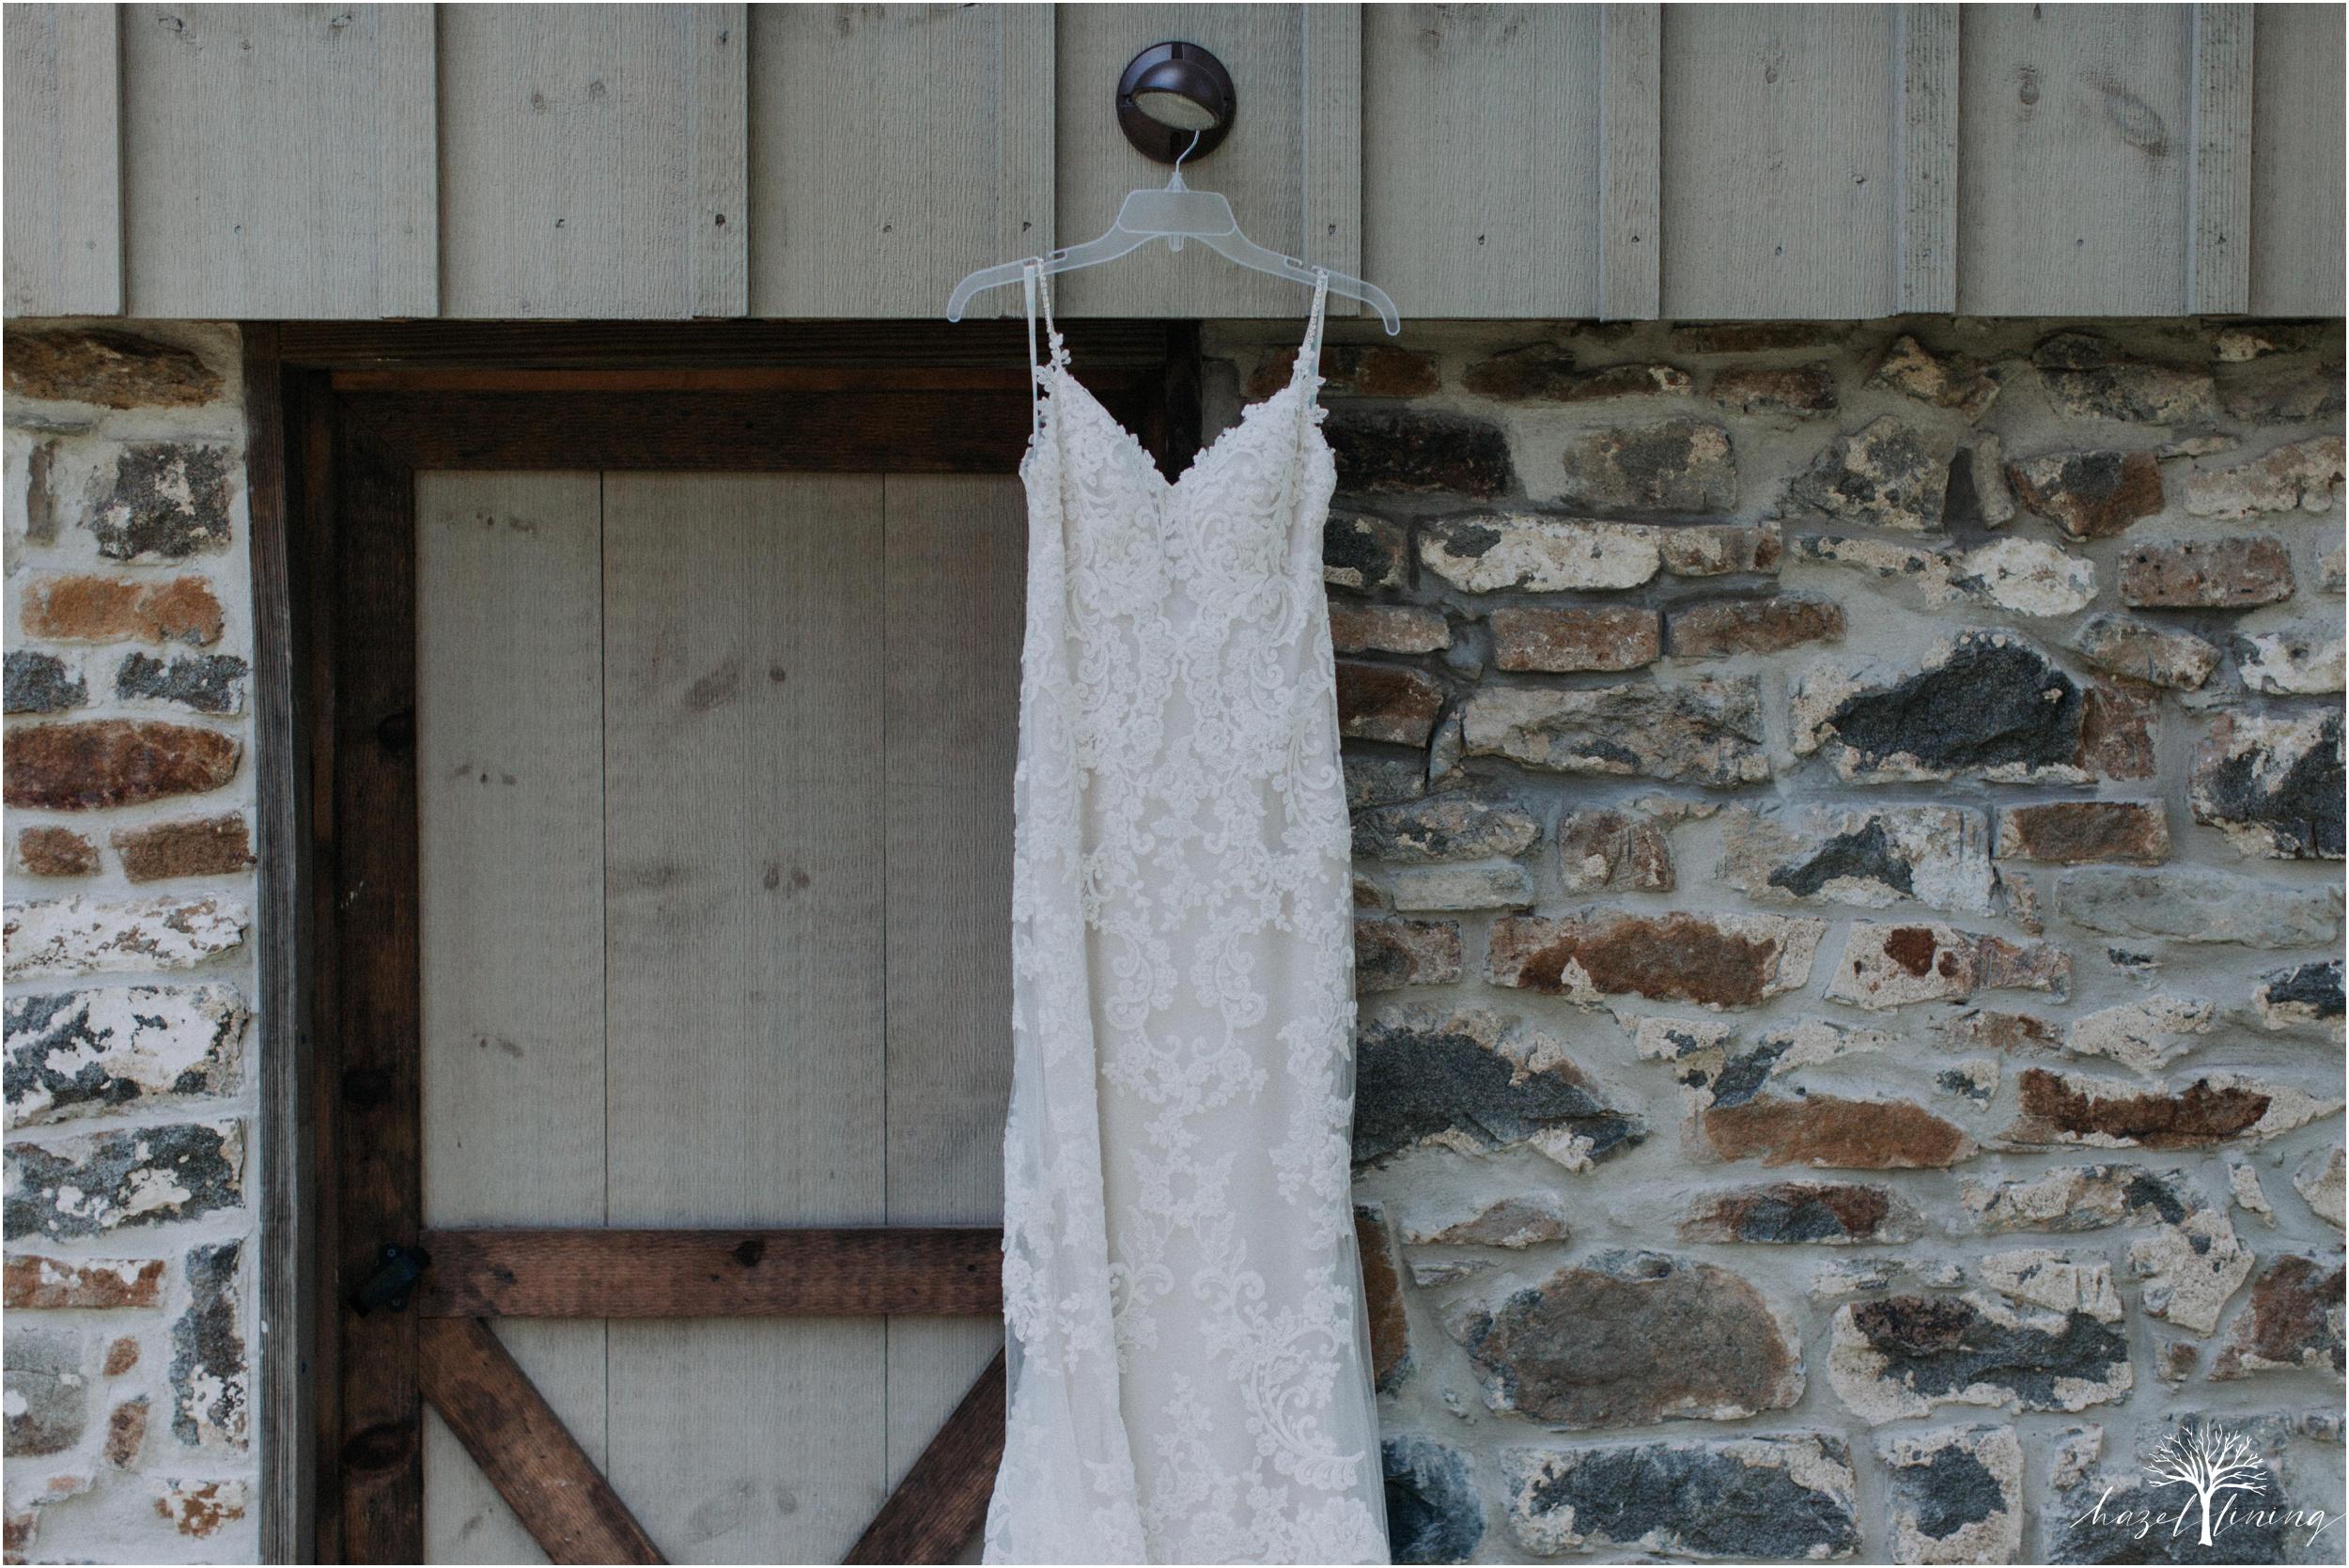 hazel-lining-travel-wedding-elopement-photography-lisa-landon-shoemaker-the-farm-bakery-and-events-bucks-county-quakertown-pennsylvania-summer-country-outdoor-farm-wedding_0001.jpg